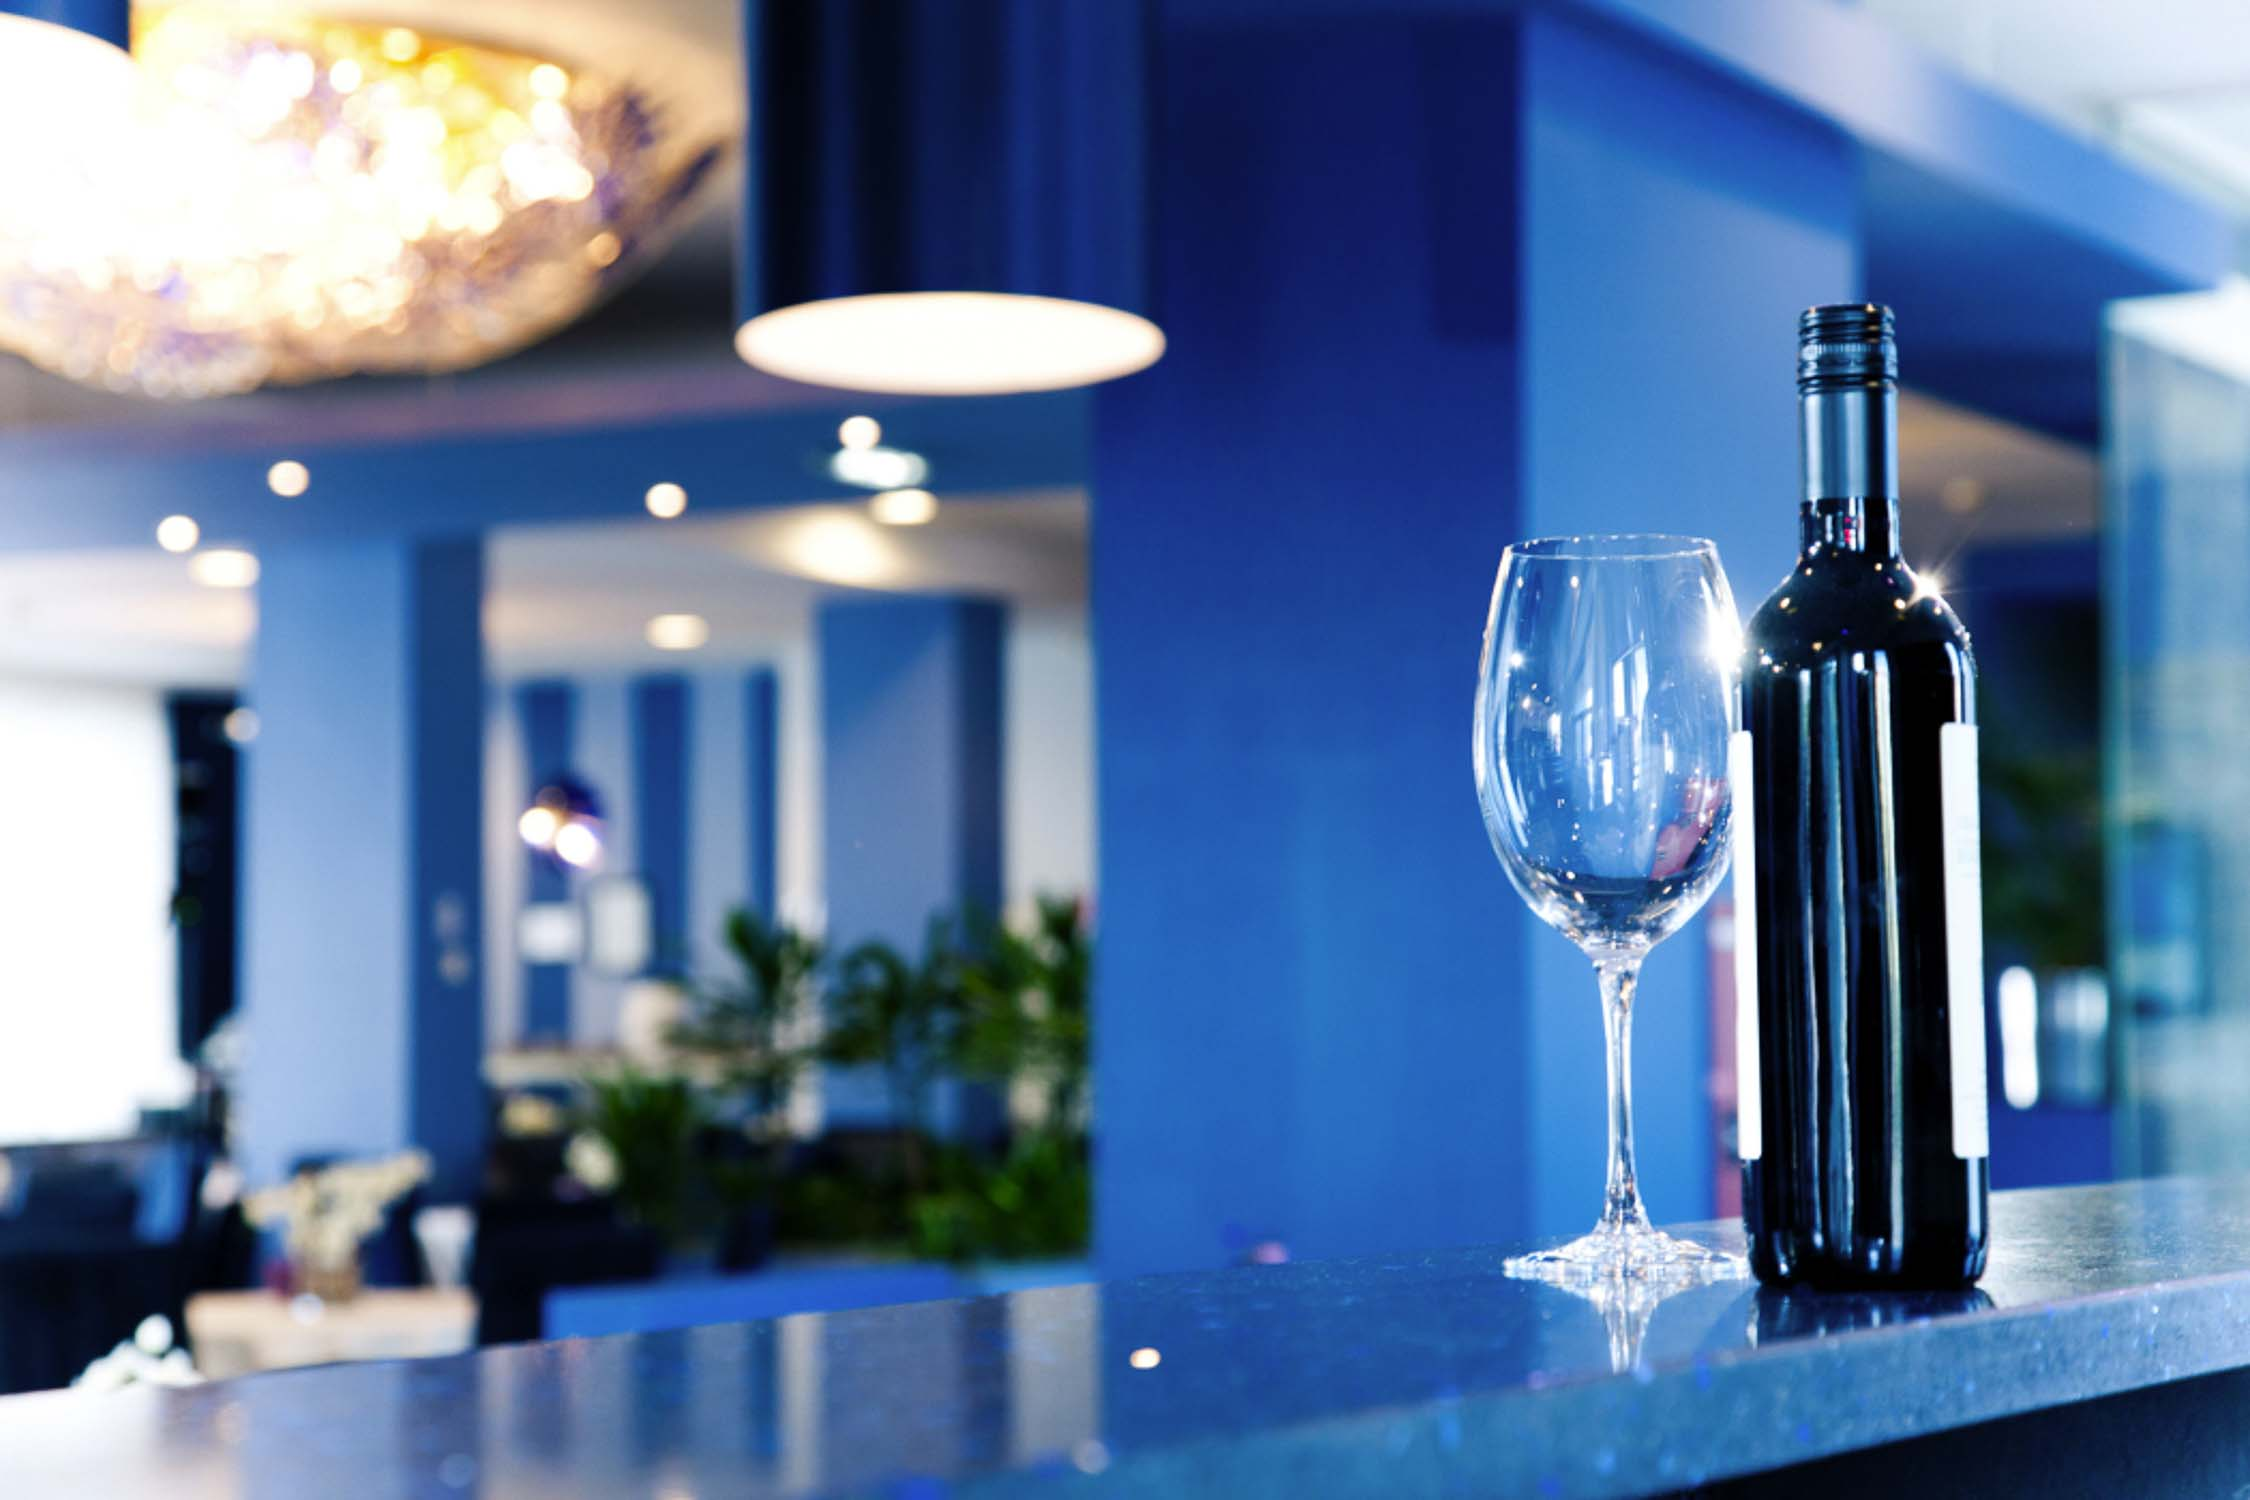 Hotelfotograf Berlin Hamburg Businessfotograf Restaurantfotograf - 0128.jpg